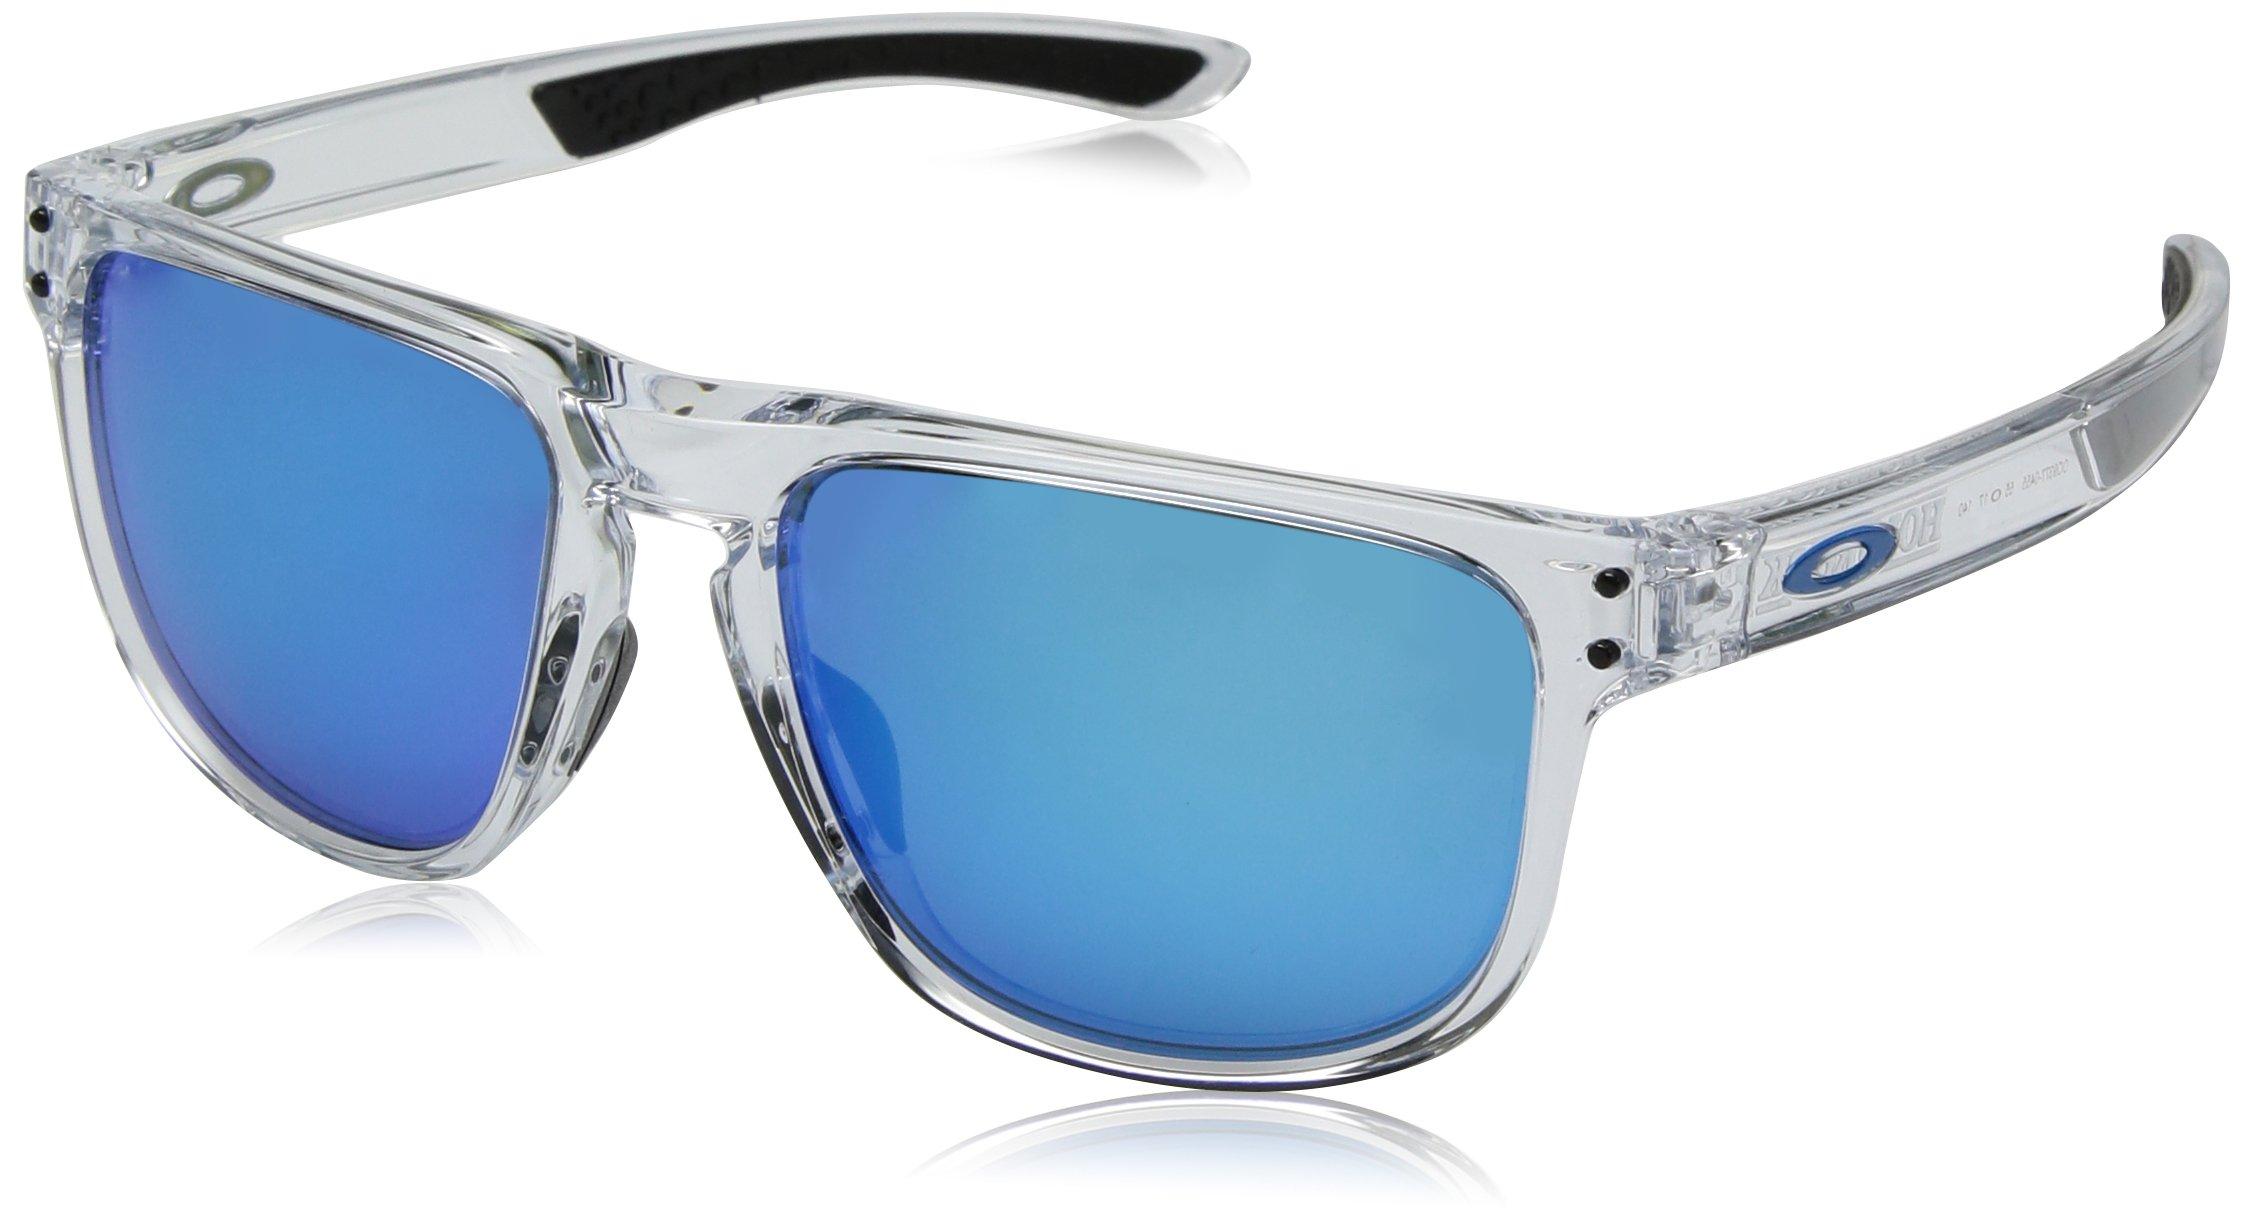 Oakley Men's Holbrook R Sunglasses,Clear